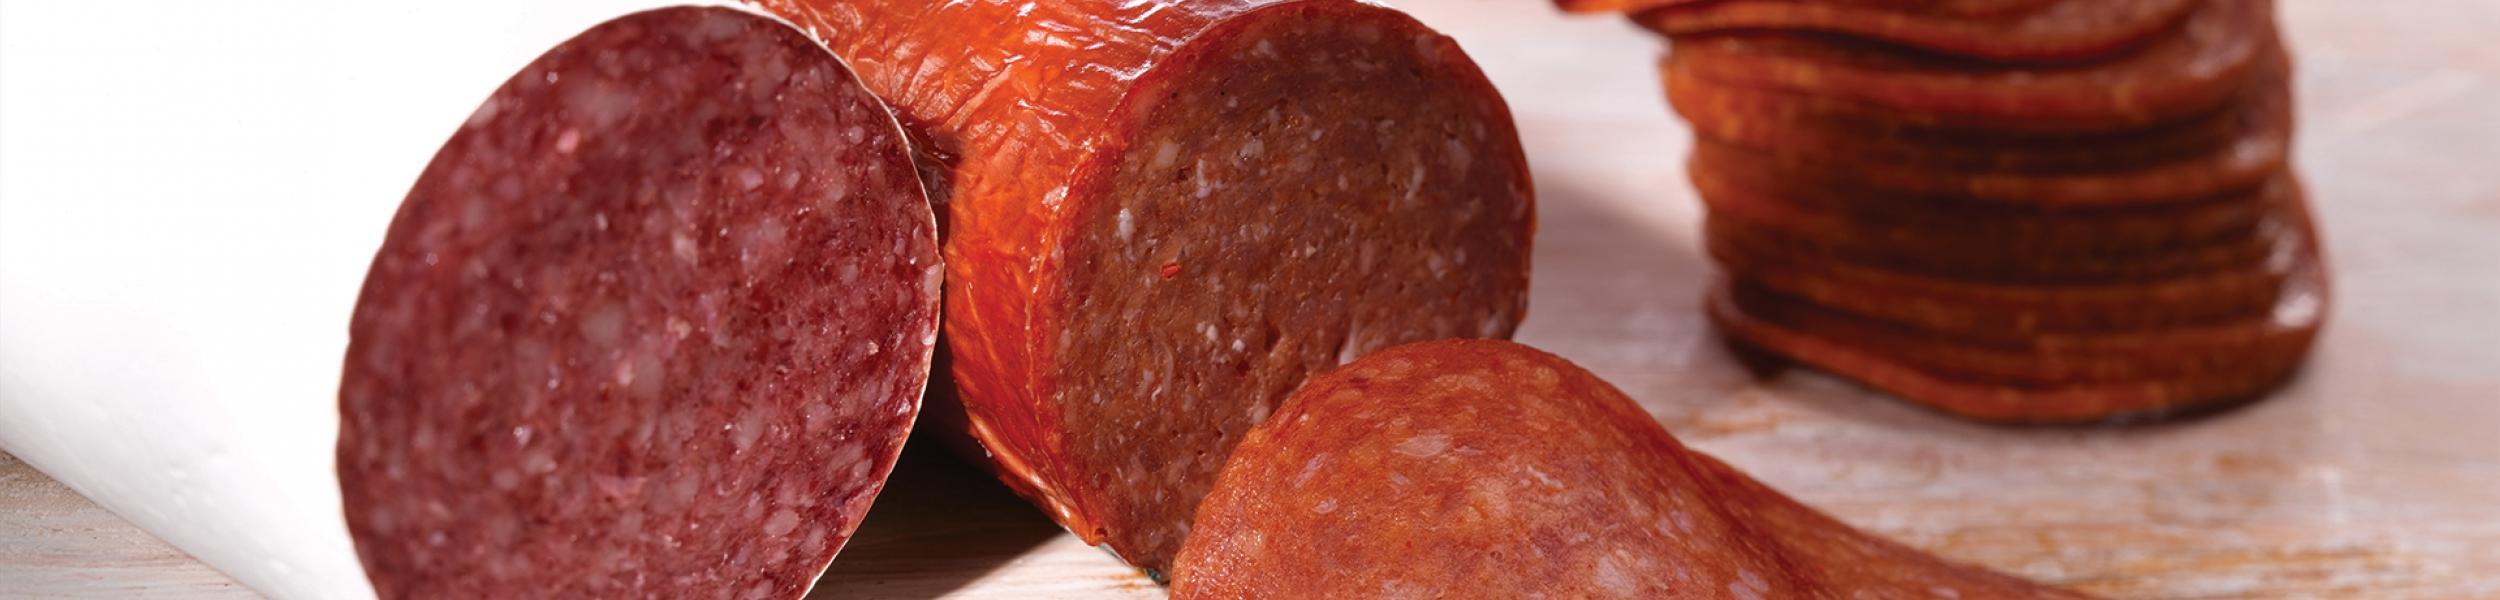 Fibrous Standard sausage casing